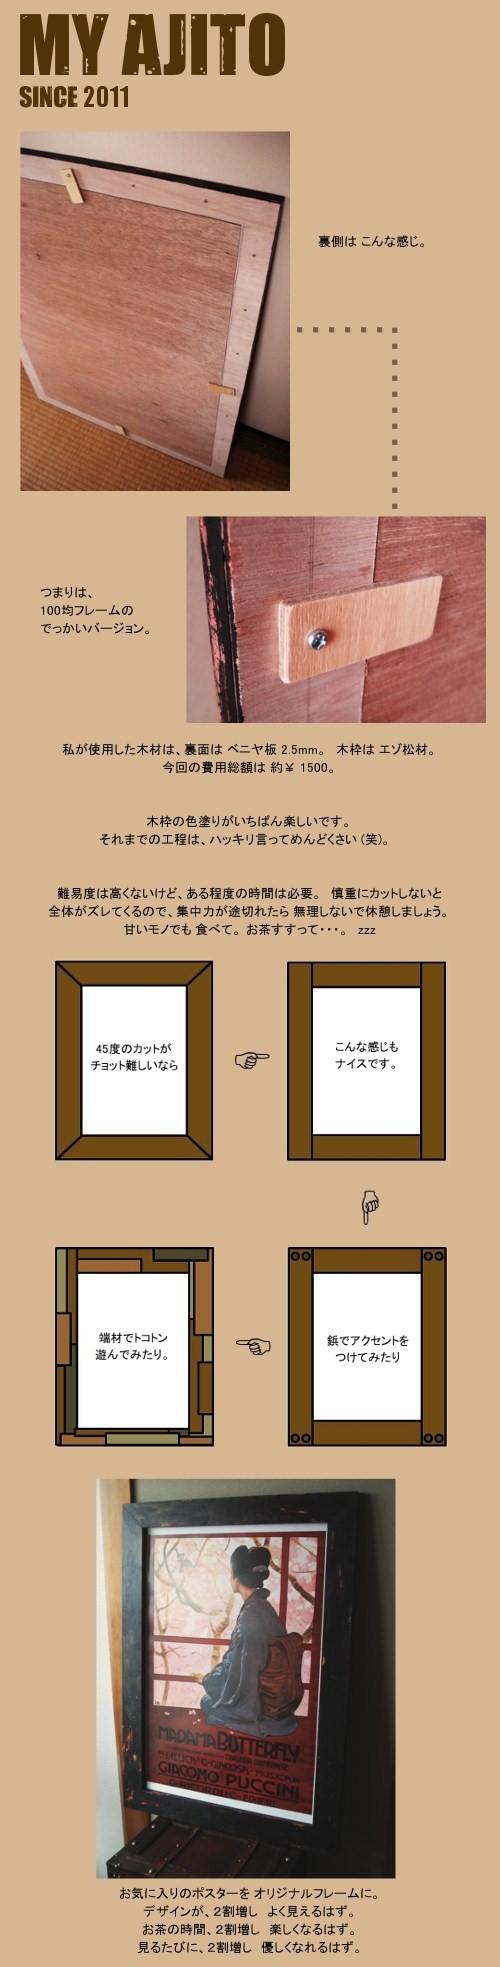 madama_04.jpg